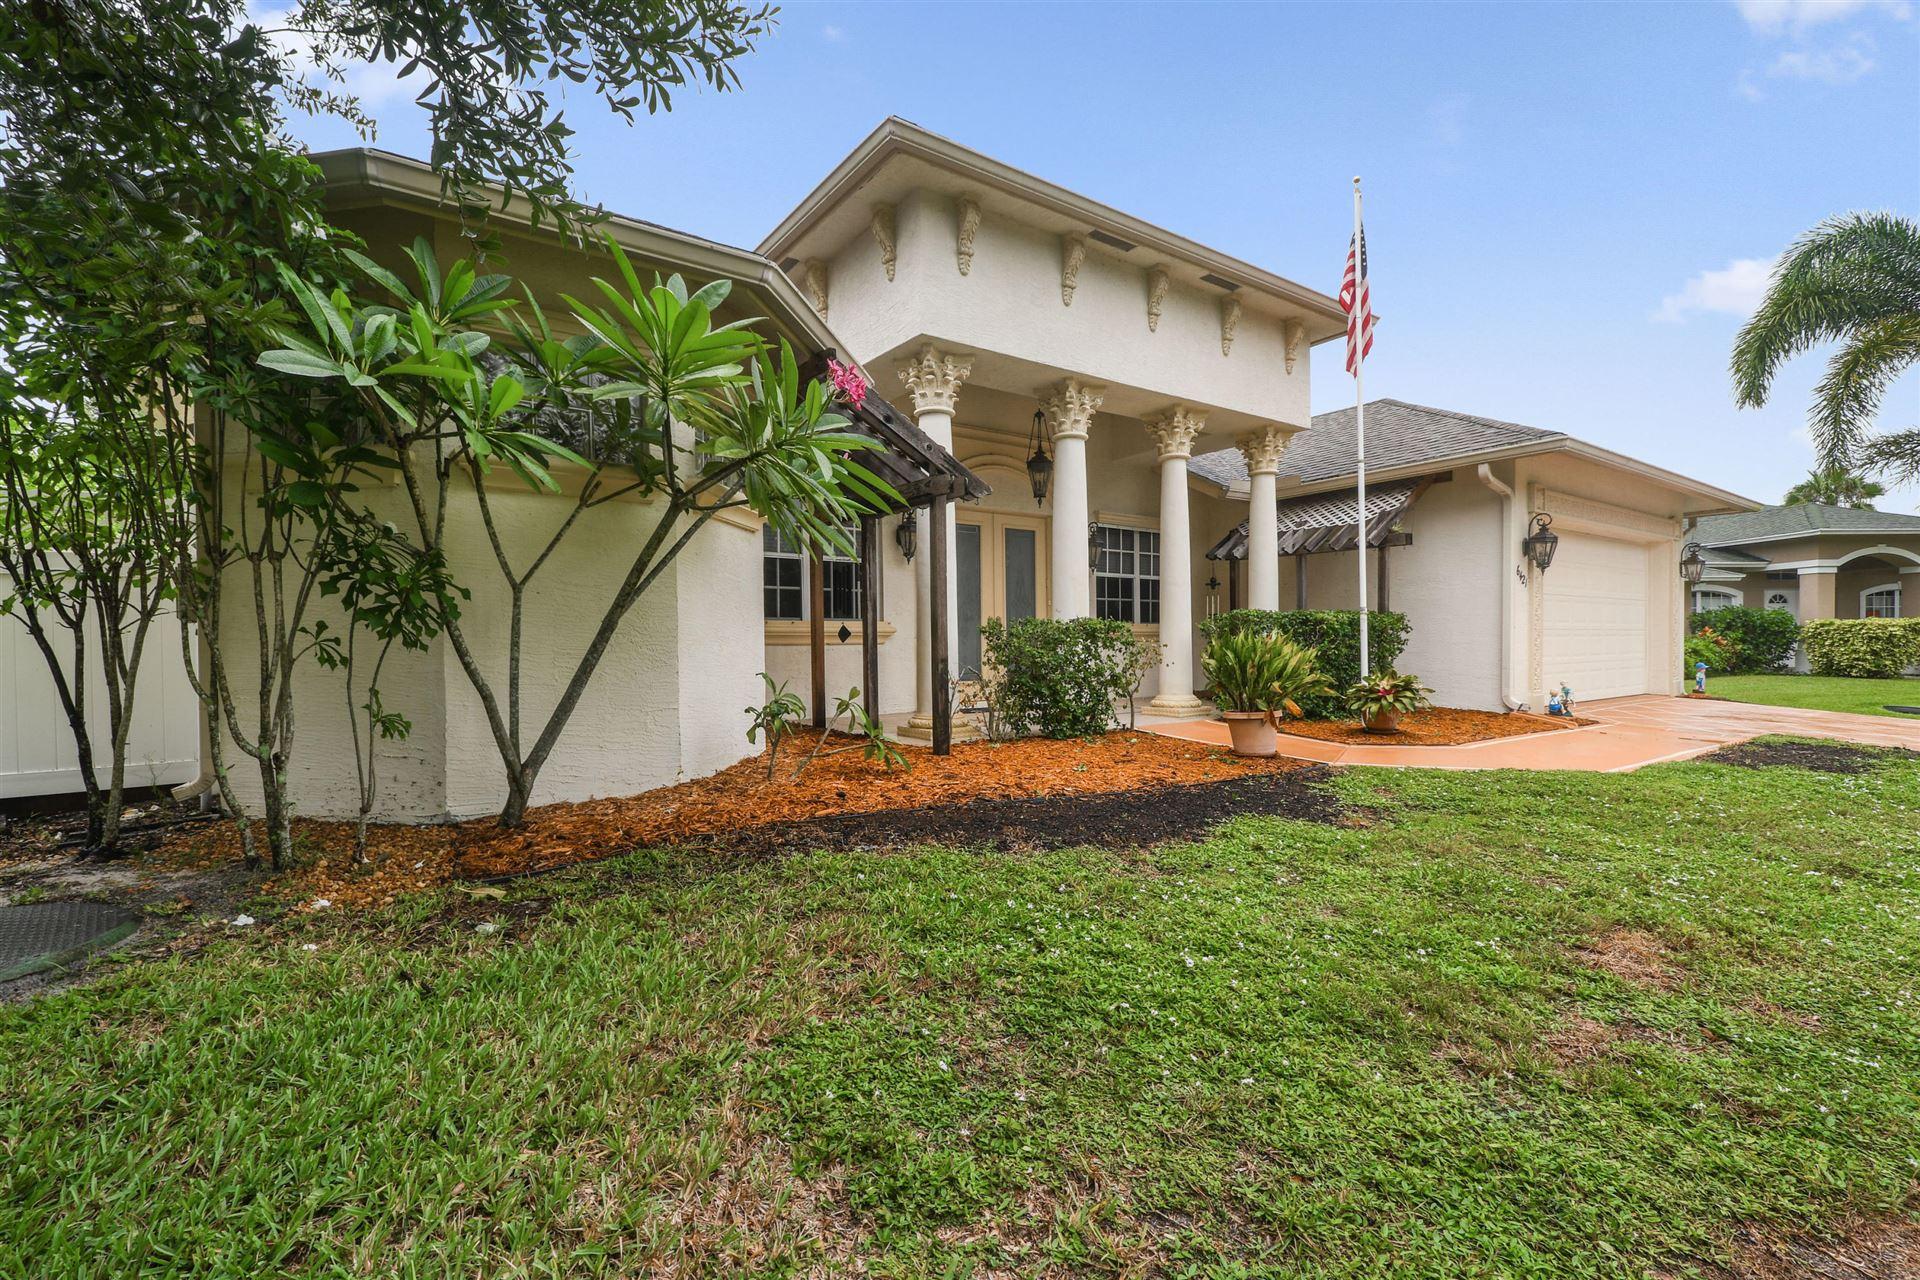 Photo of 6421 NW Verdi Court, Port Saint Lucie, FL 34986 (MLS # RX-10736319)